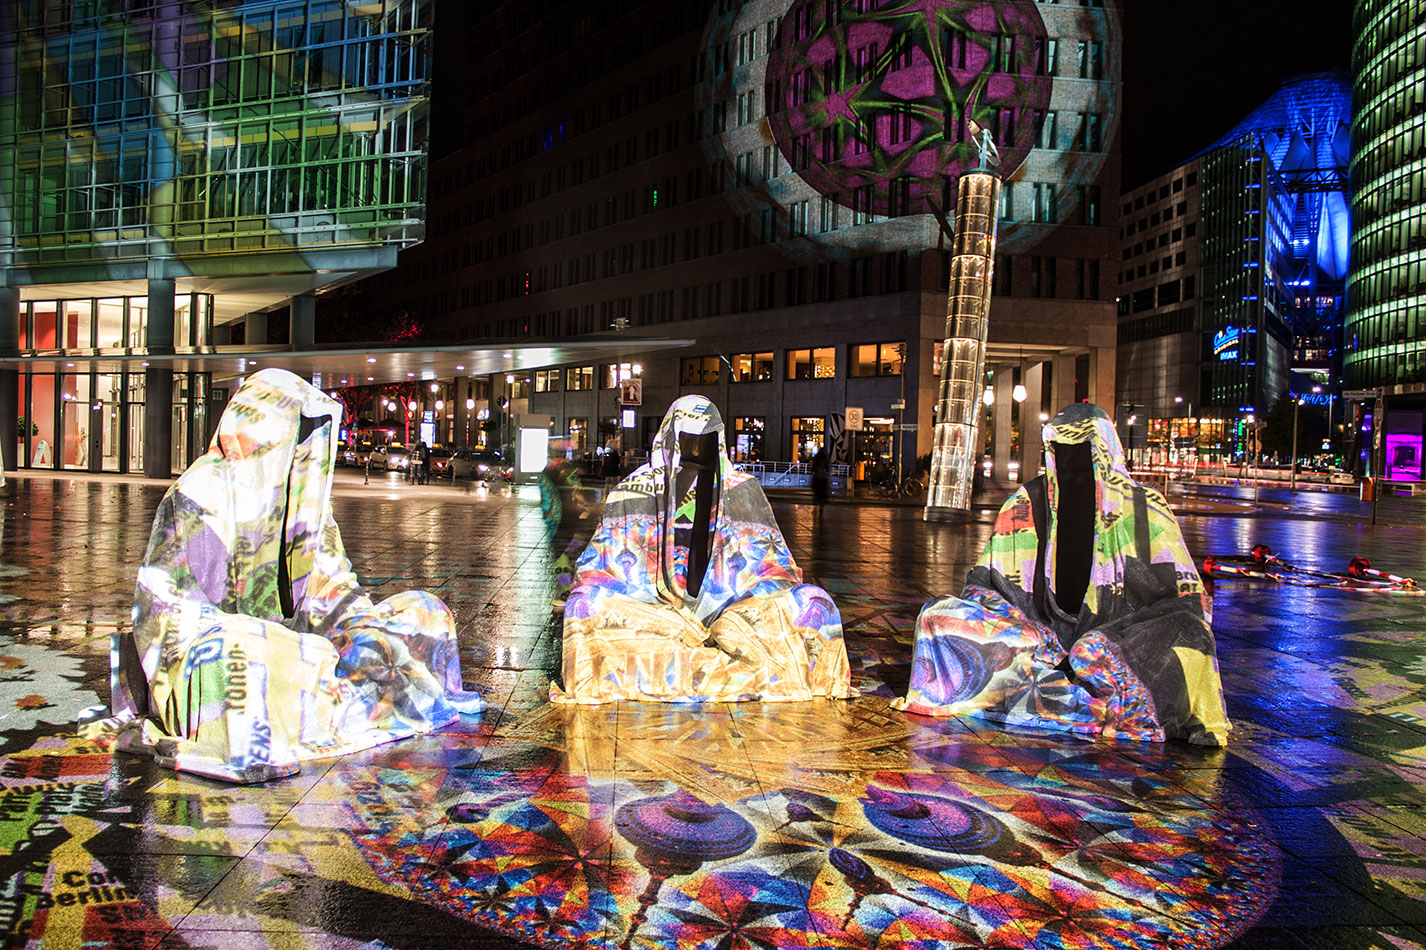 festival-of-lights-berlin-light-art-festival-contemporary-fine-art-design-show-large-scale-sculpture-guardiansof-time-manfred-kili-kielnhofer-sculpture-3865